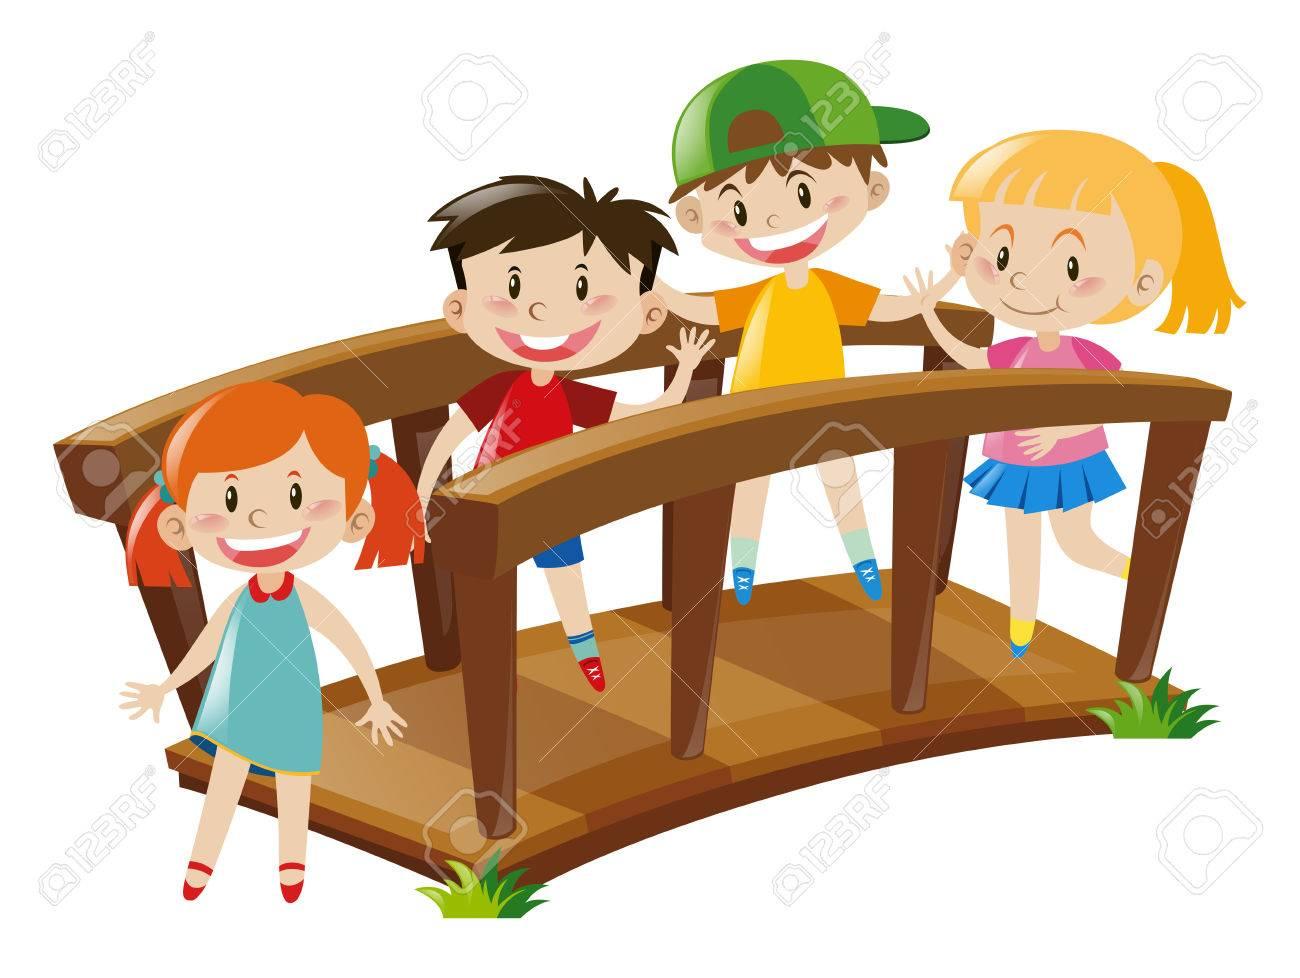 Four kids crossing wooden bridge illustration - 66895129